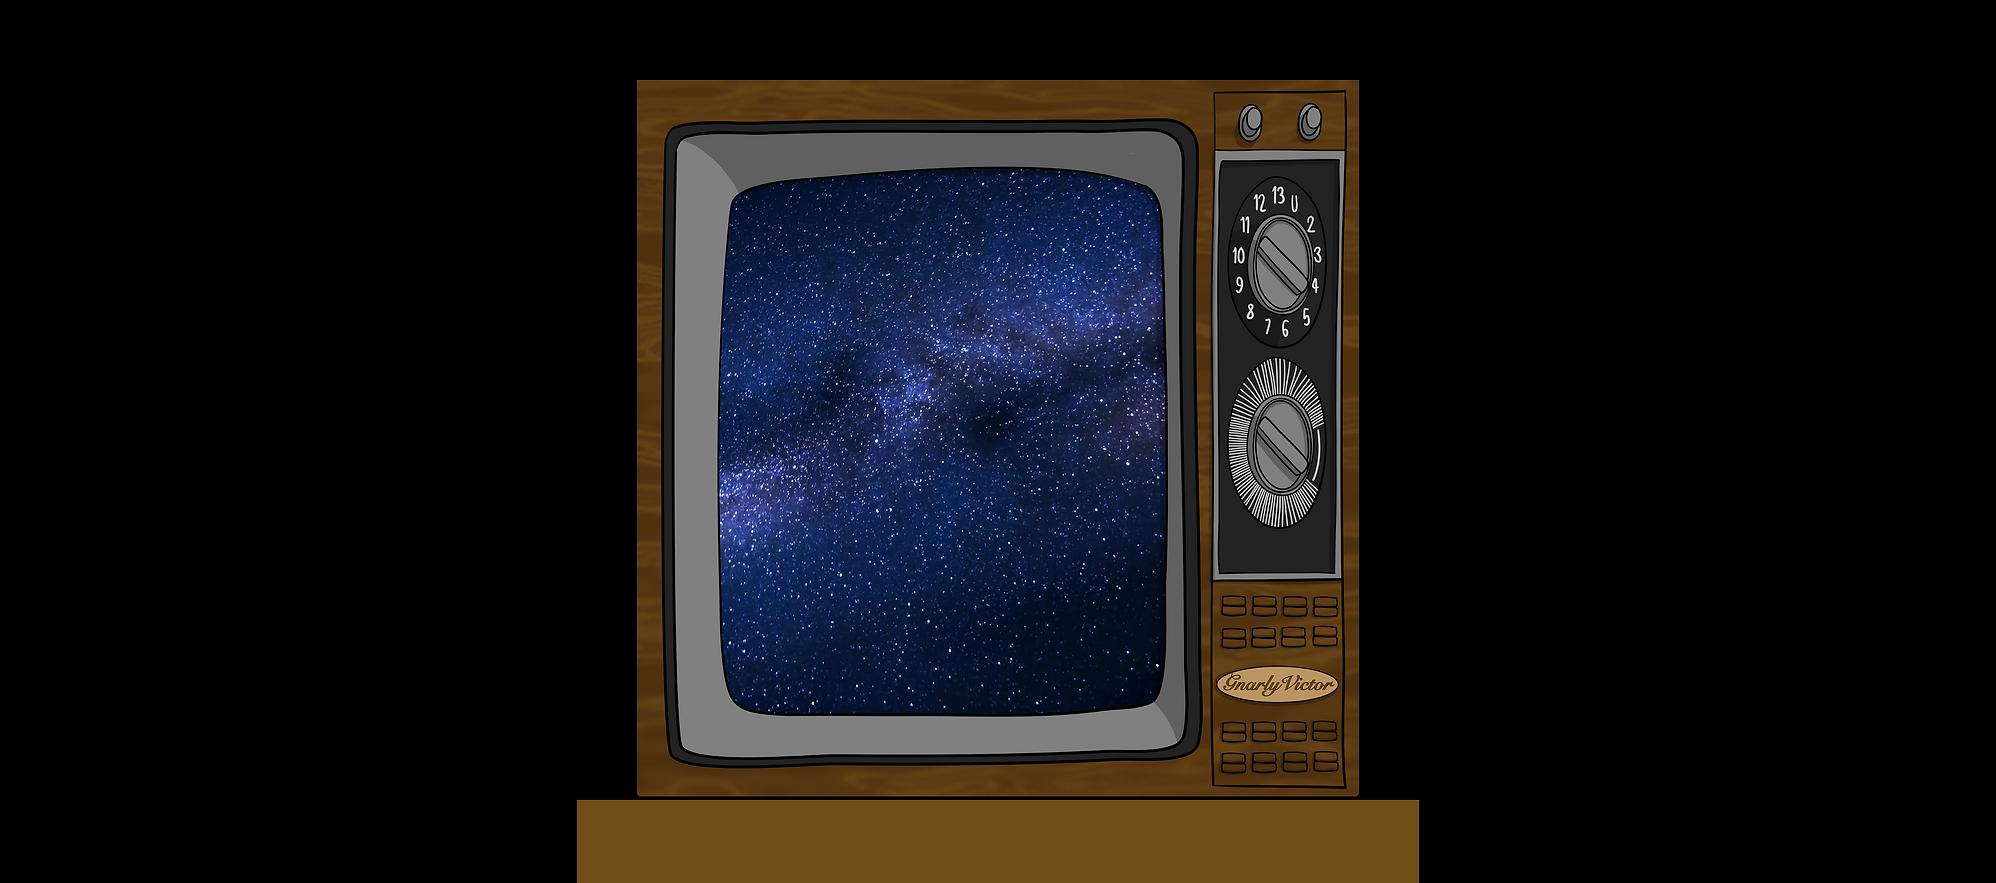 tv 1990.png